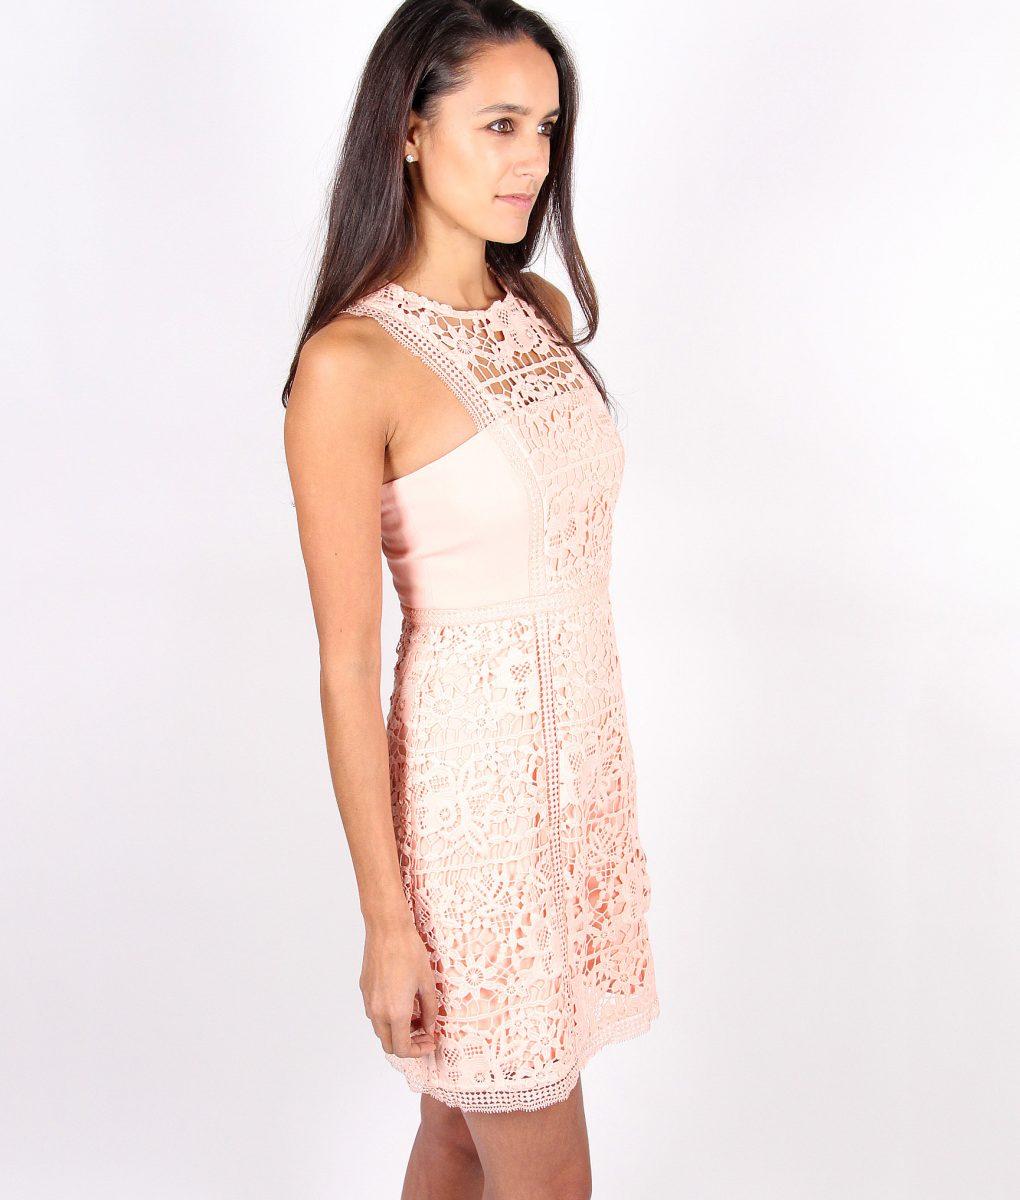 Lumier Peach Lace Dress side